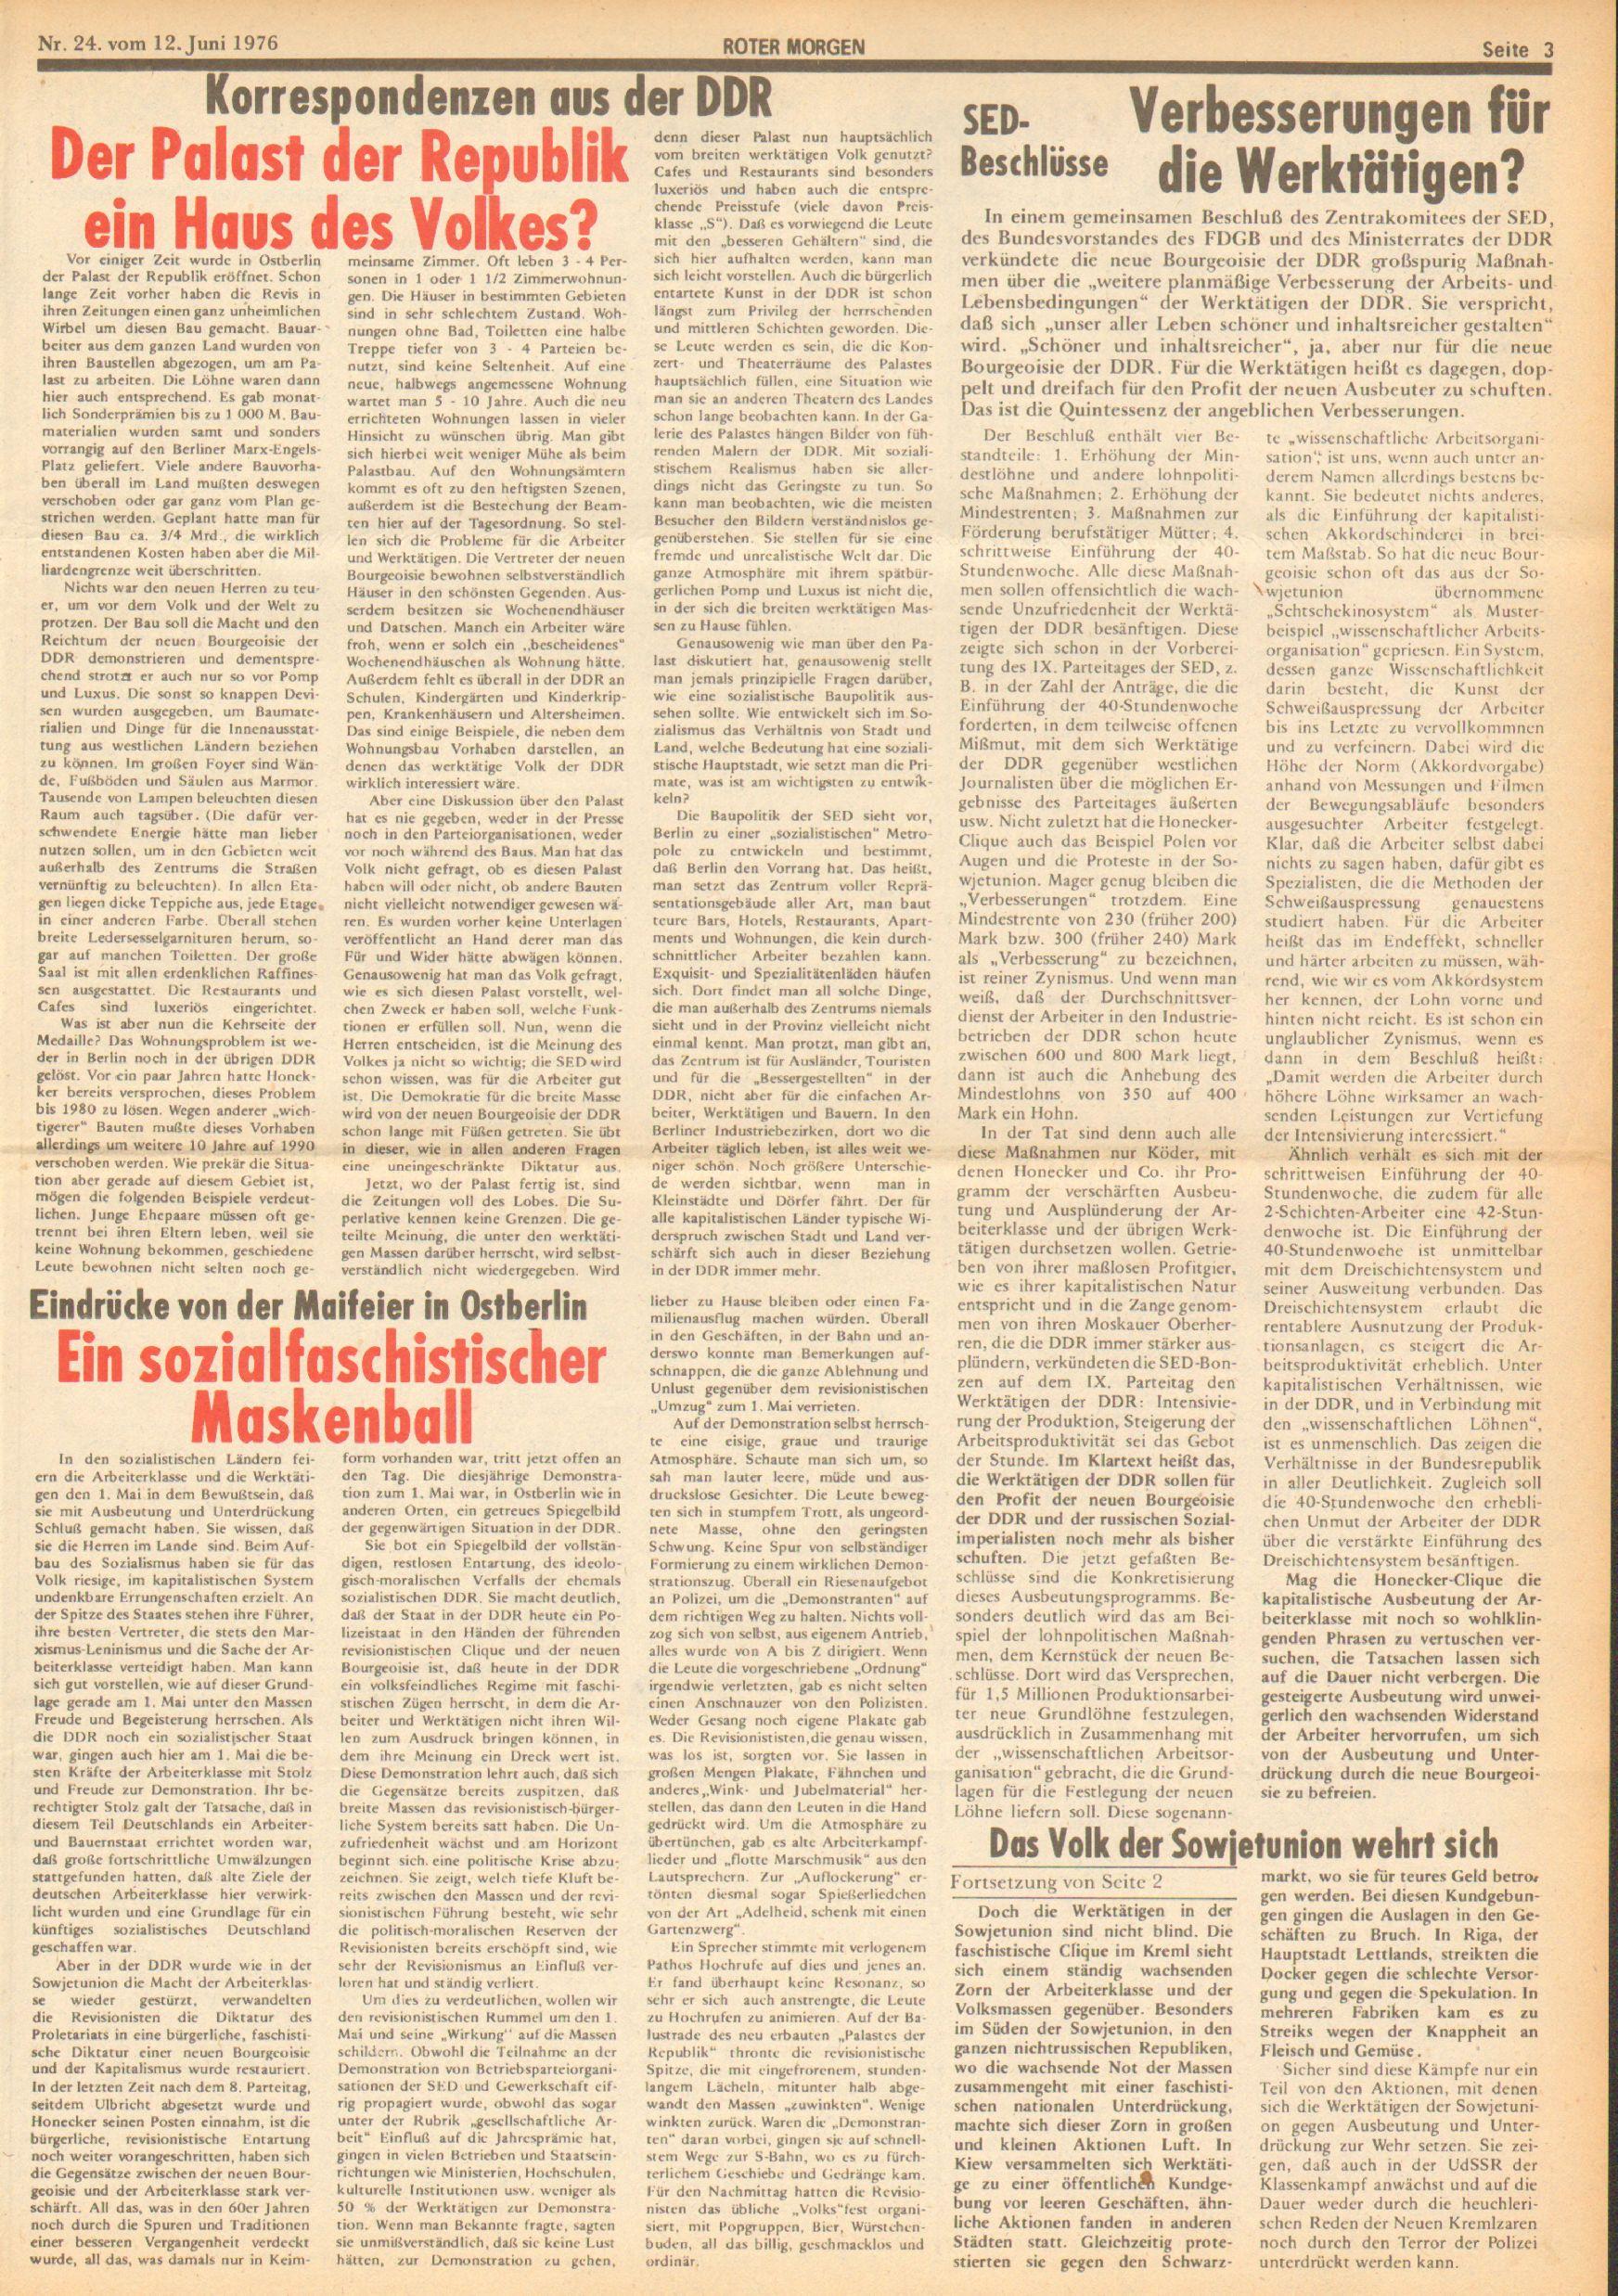 Roter Morgen, 10. Jg., 12. Juni 1976, Nr. 24, Seite 3